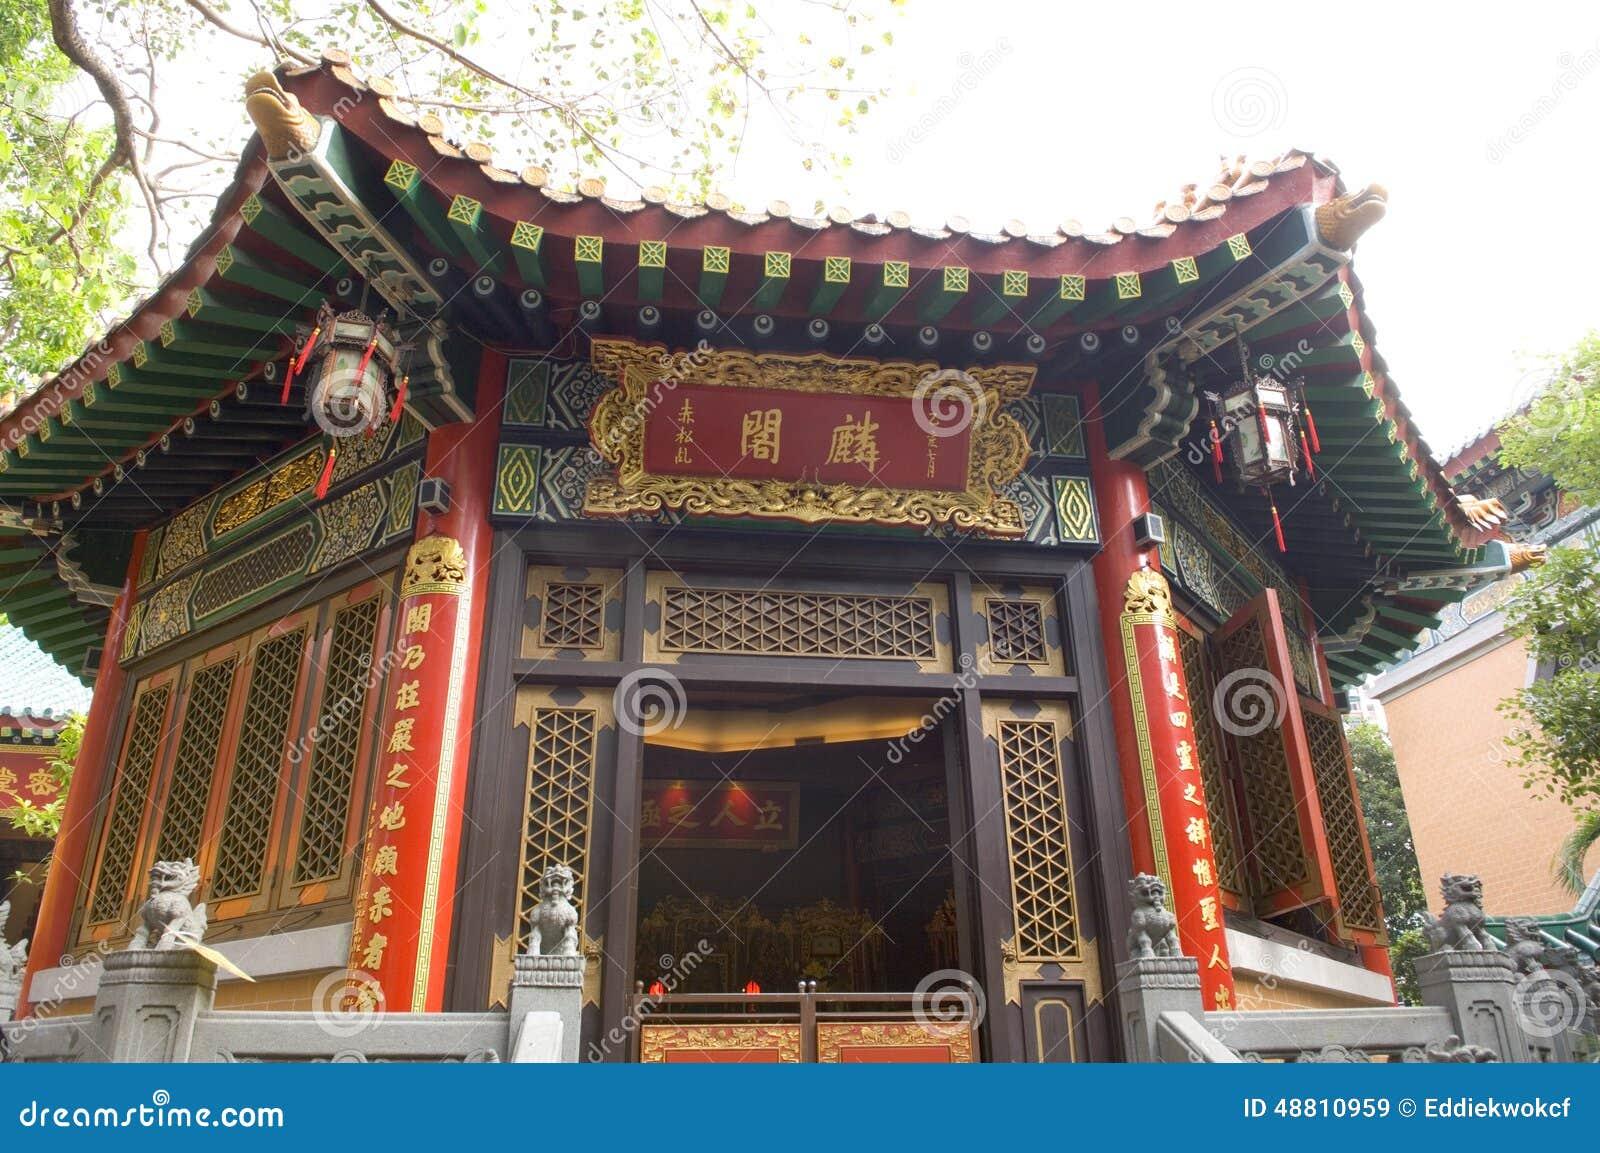 CIm Insence Kau молитве Wong вероисповедания Hall Sik Sik Yuen Wong Tai Sin Temple Конфуция большой бессмертный